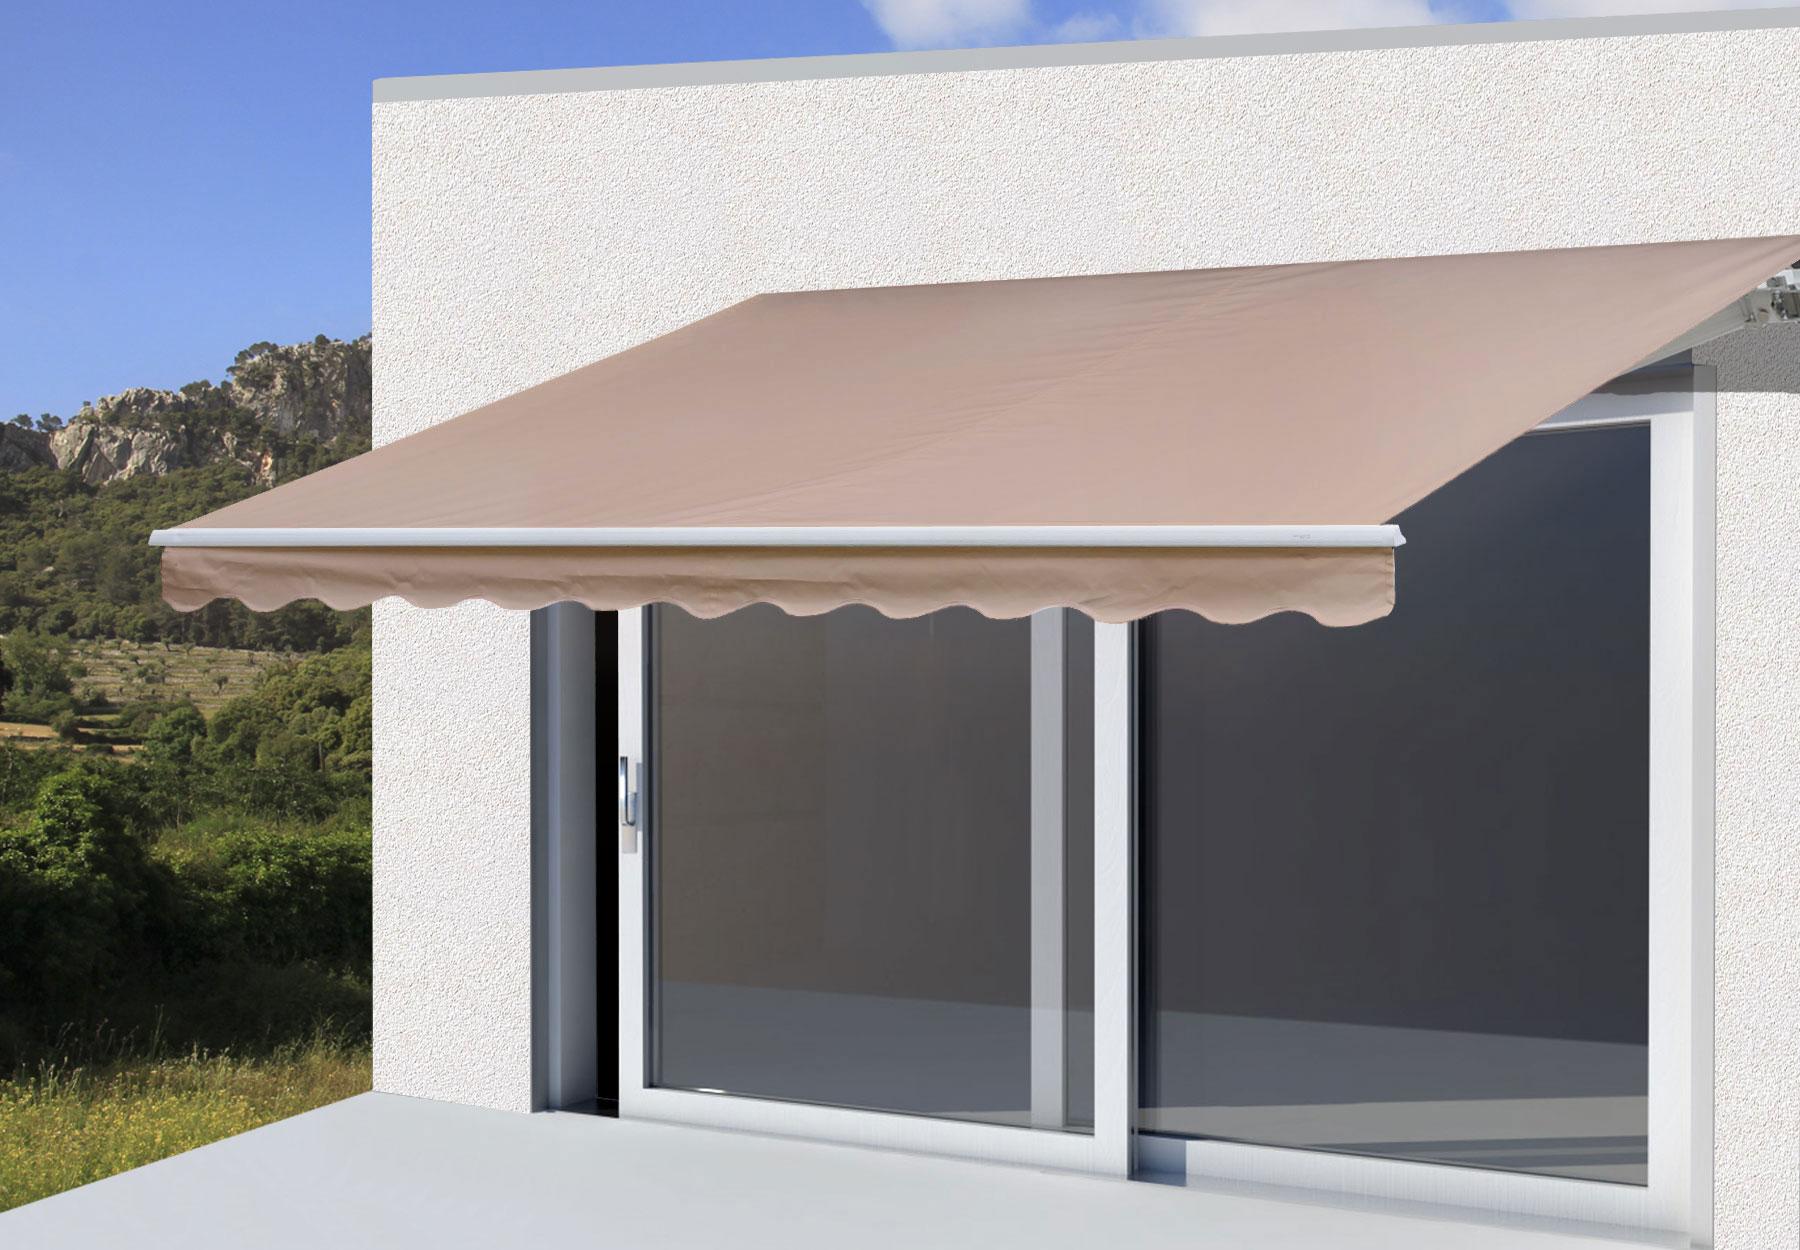 alu markise t121 gelenkarmmarkise sonnenschutz 3 5x3m polyester ebay. Black Bedroom Furniture Sets. Home Design Ideas